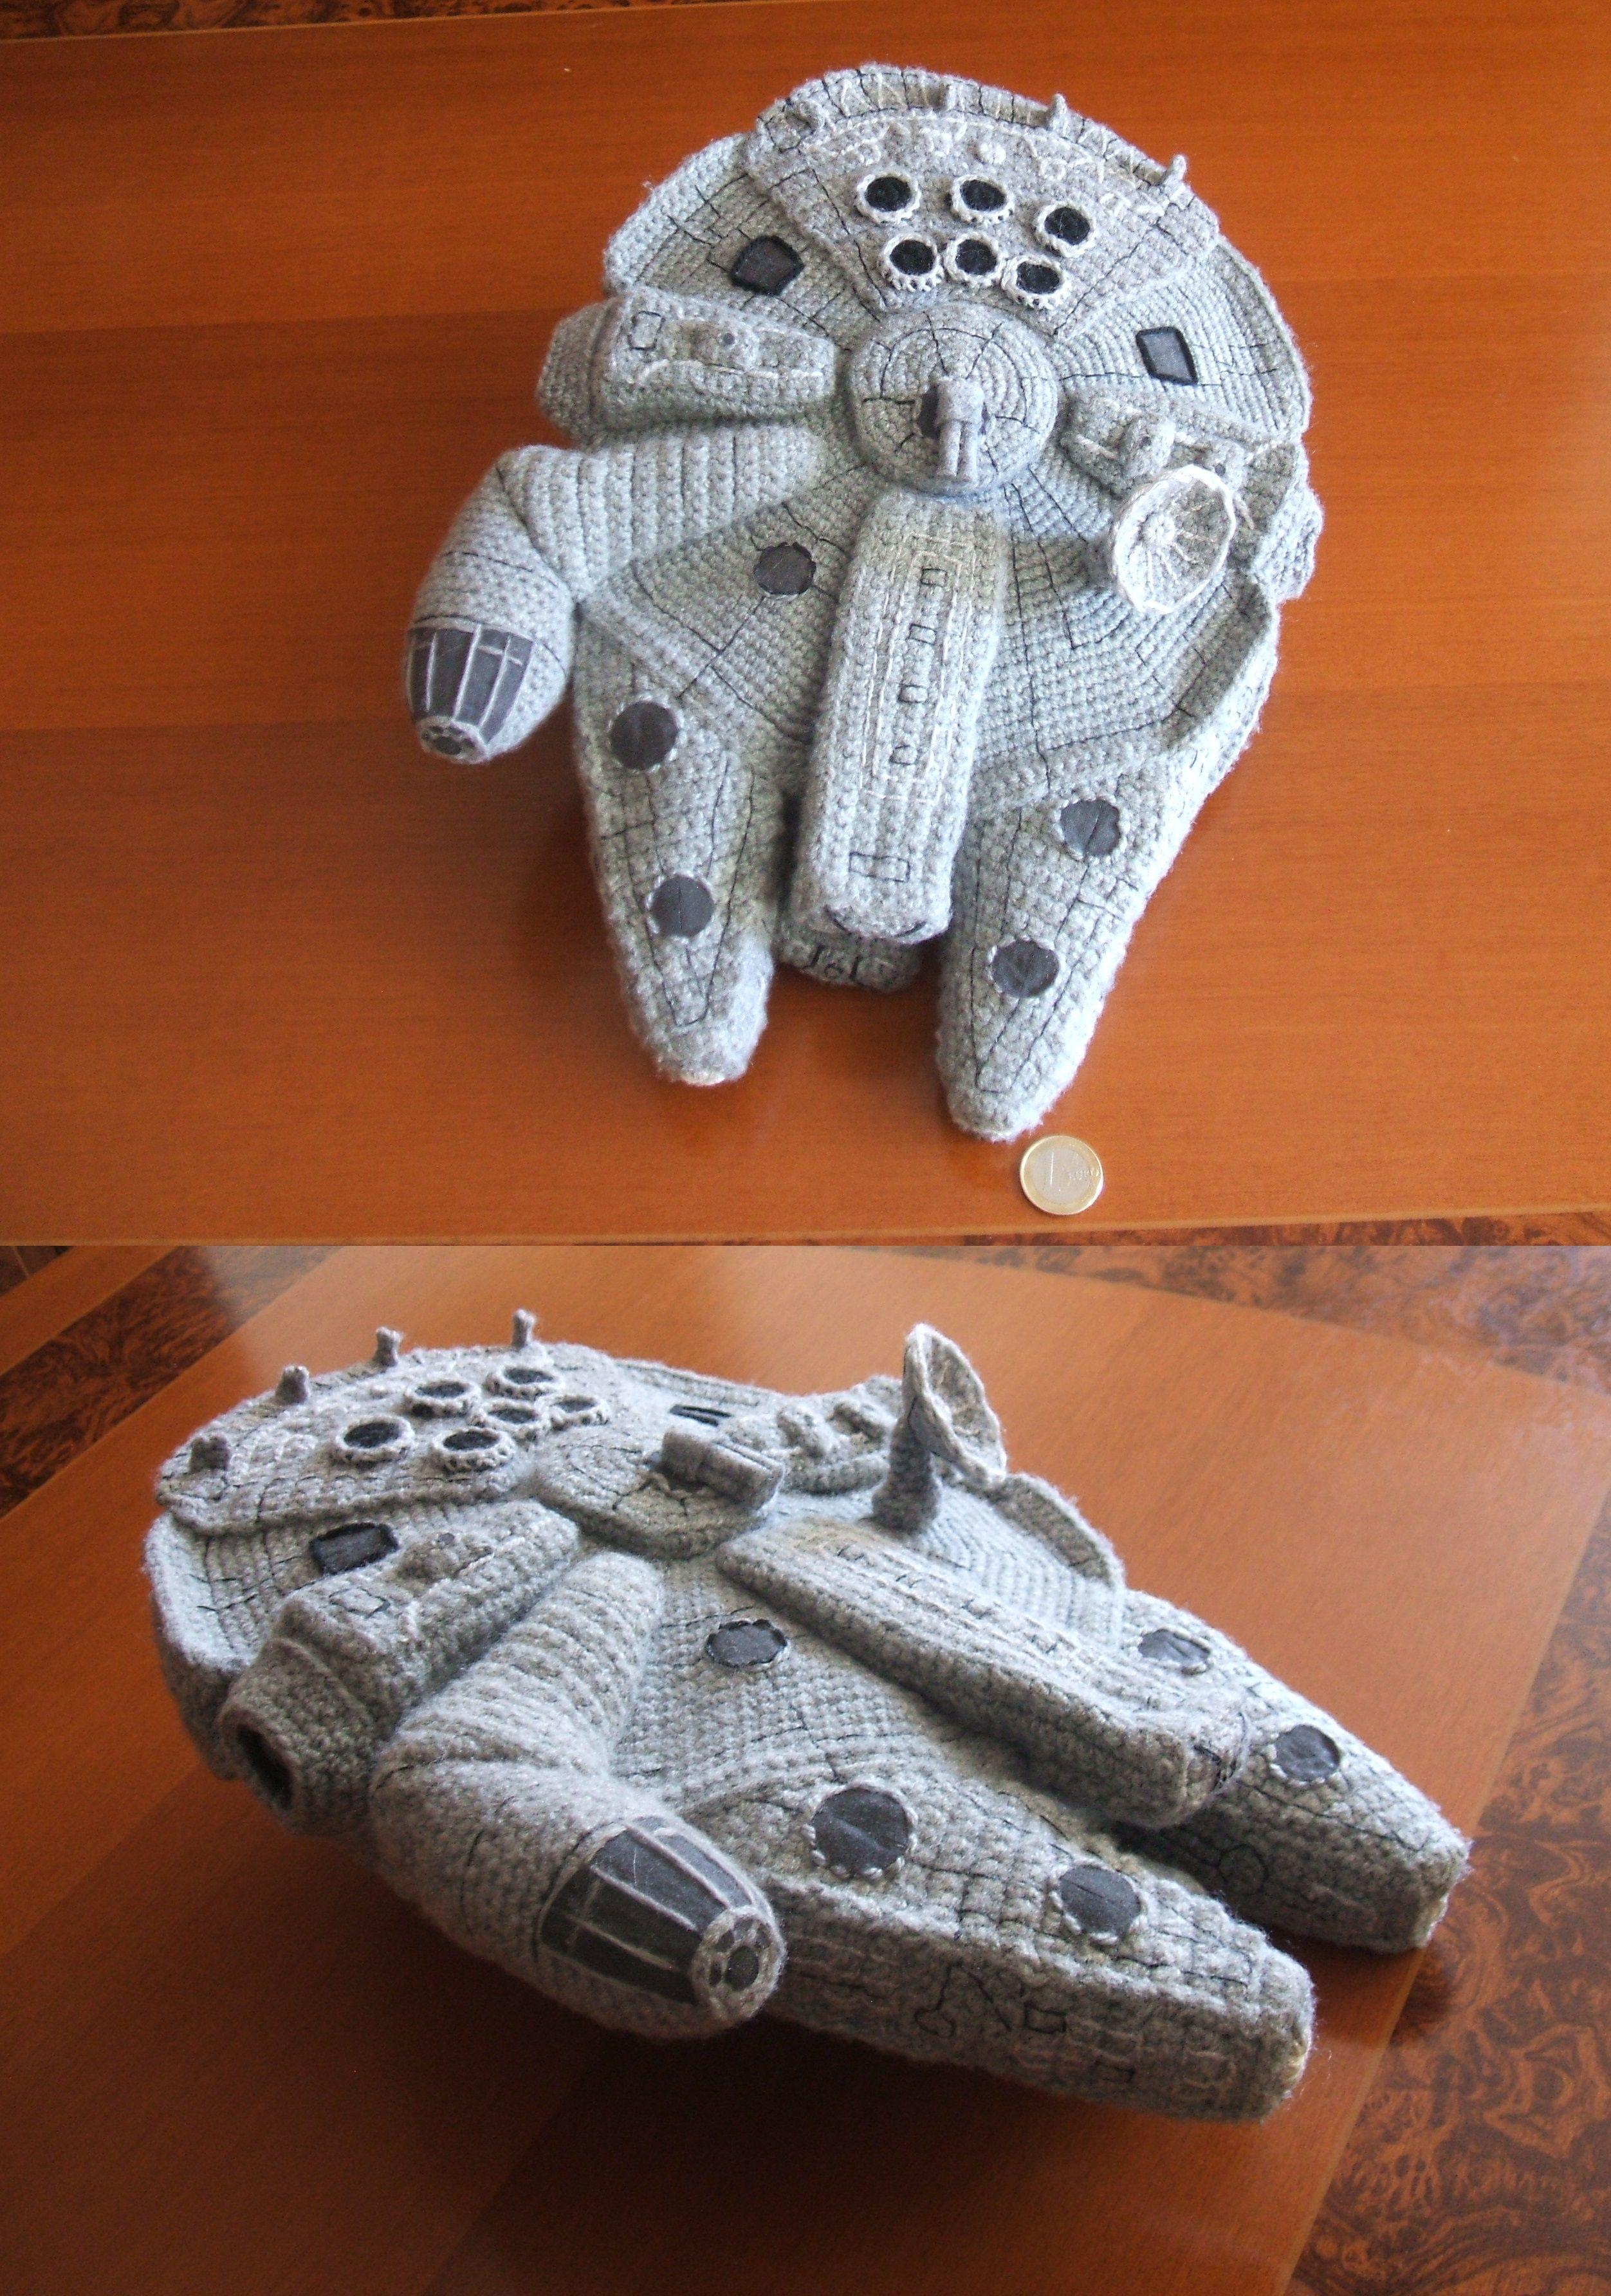 Death Star Amigurumi Pattern : Crochet, Amigurumi Millenium Falcon (Star Wars) by Belen R ...